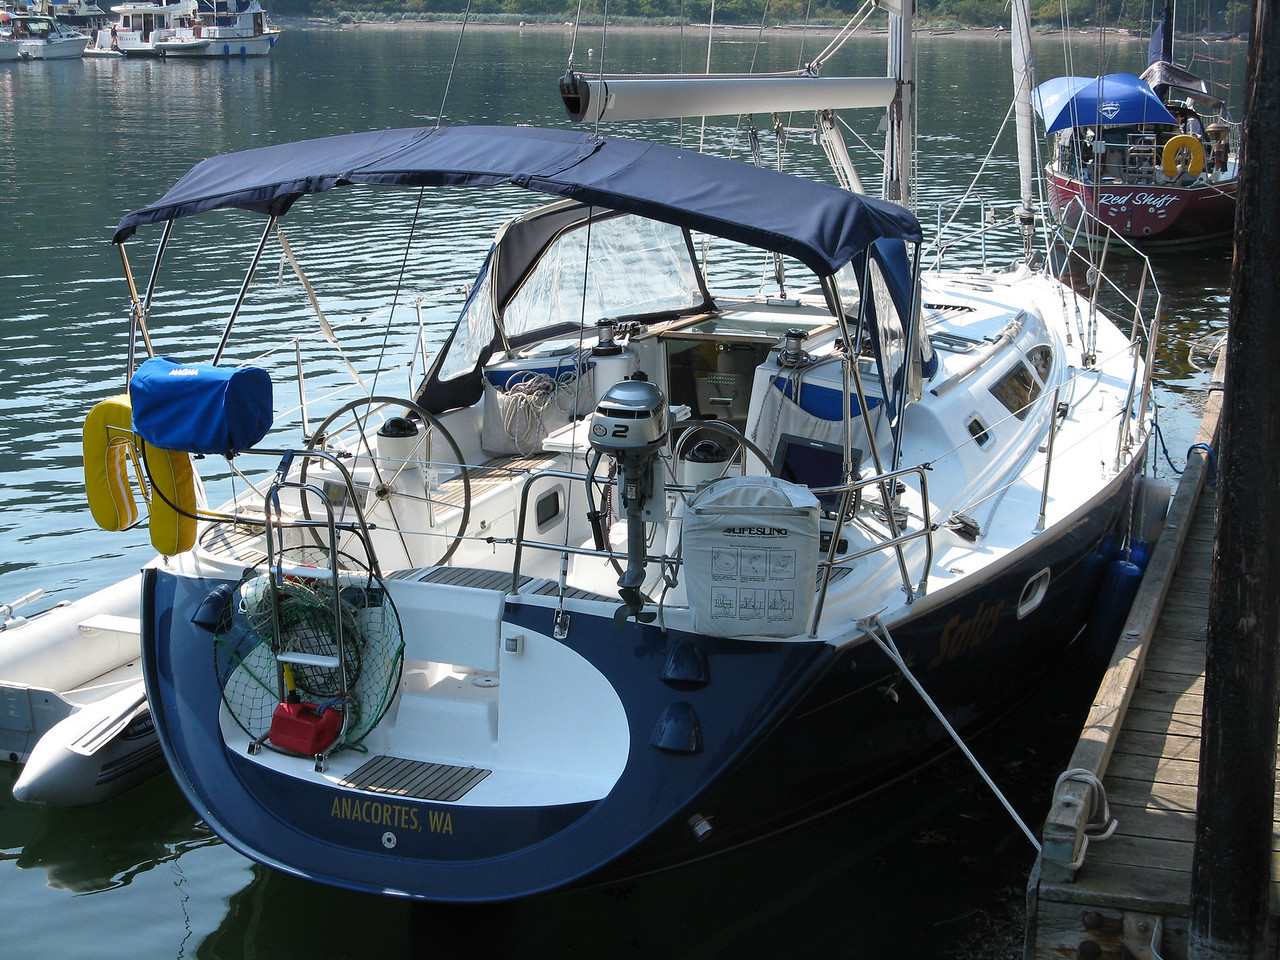 09 07 26-08 02 Sail SJ 179